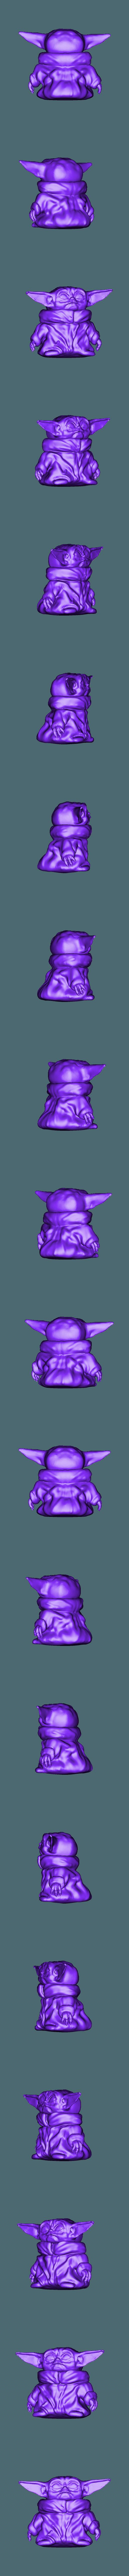 baby_yoda_updated_version.obj Télécharger fichier OBJ gratuit Bébé Yoda • Plan pour imprimante 3D, chernyavskayasve